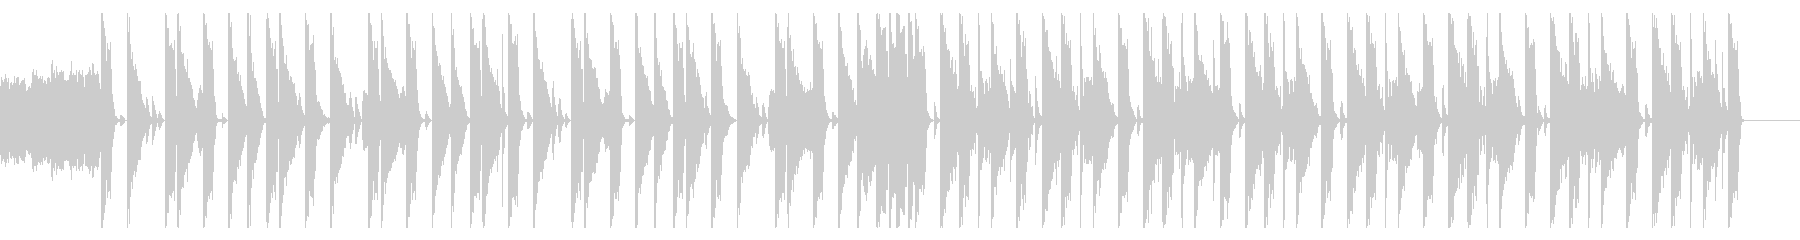 146 BPMの未再生の波形